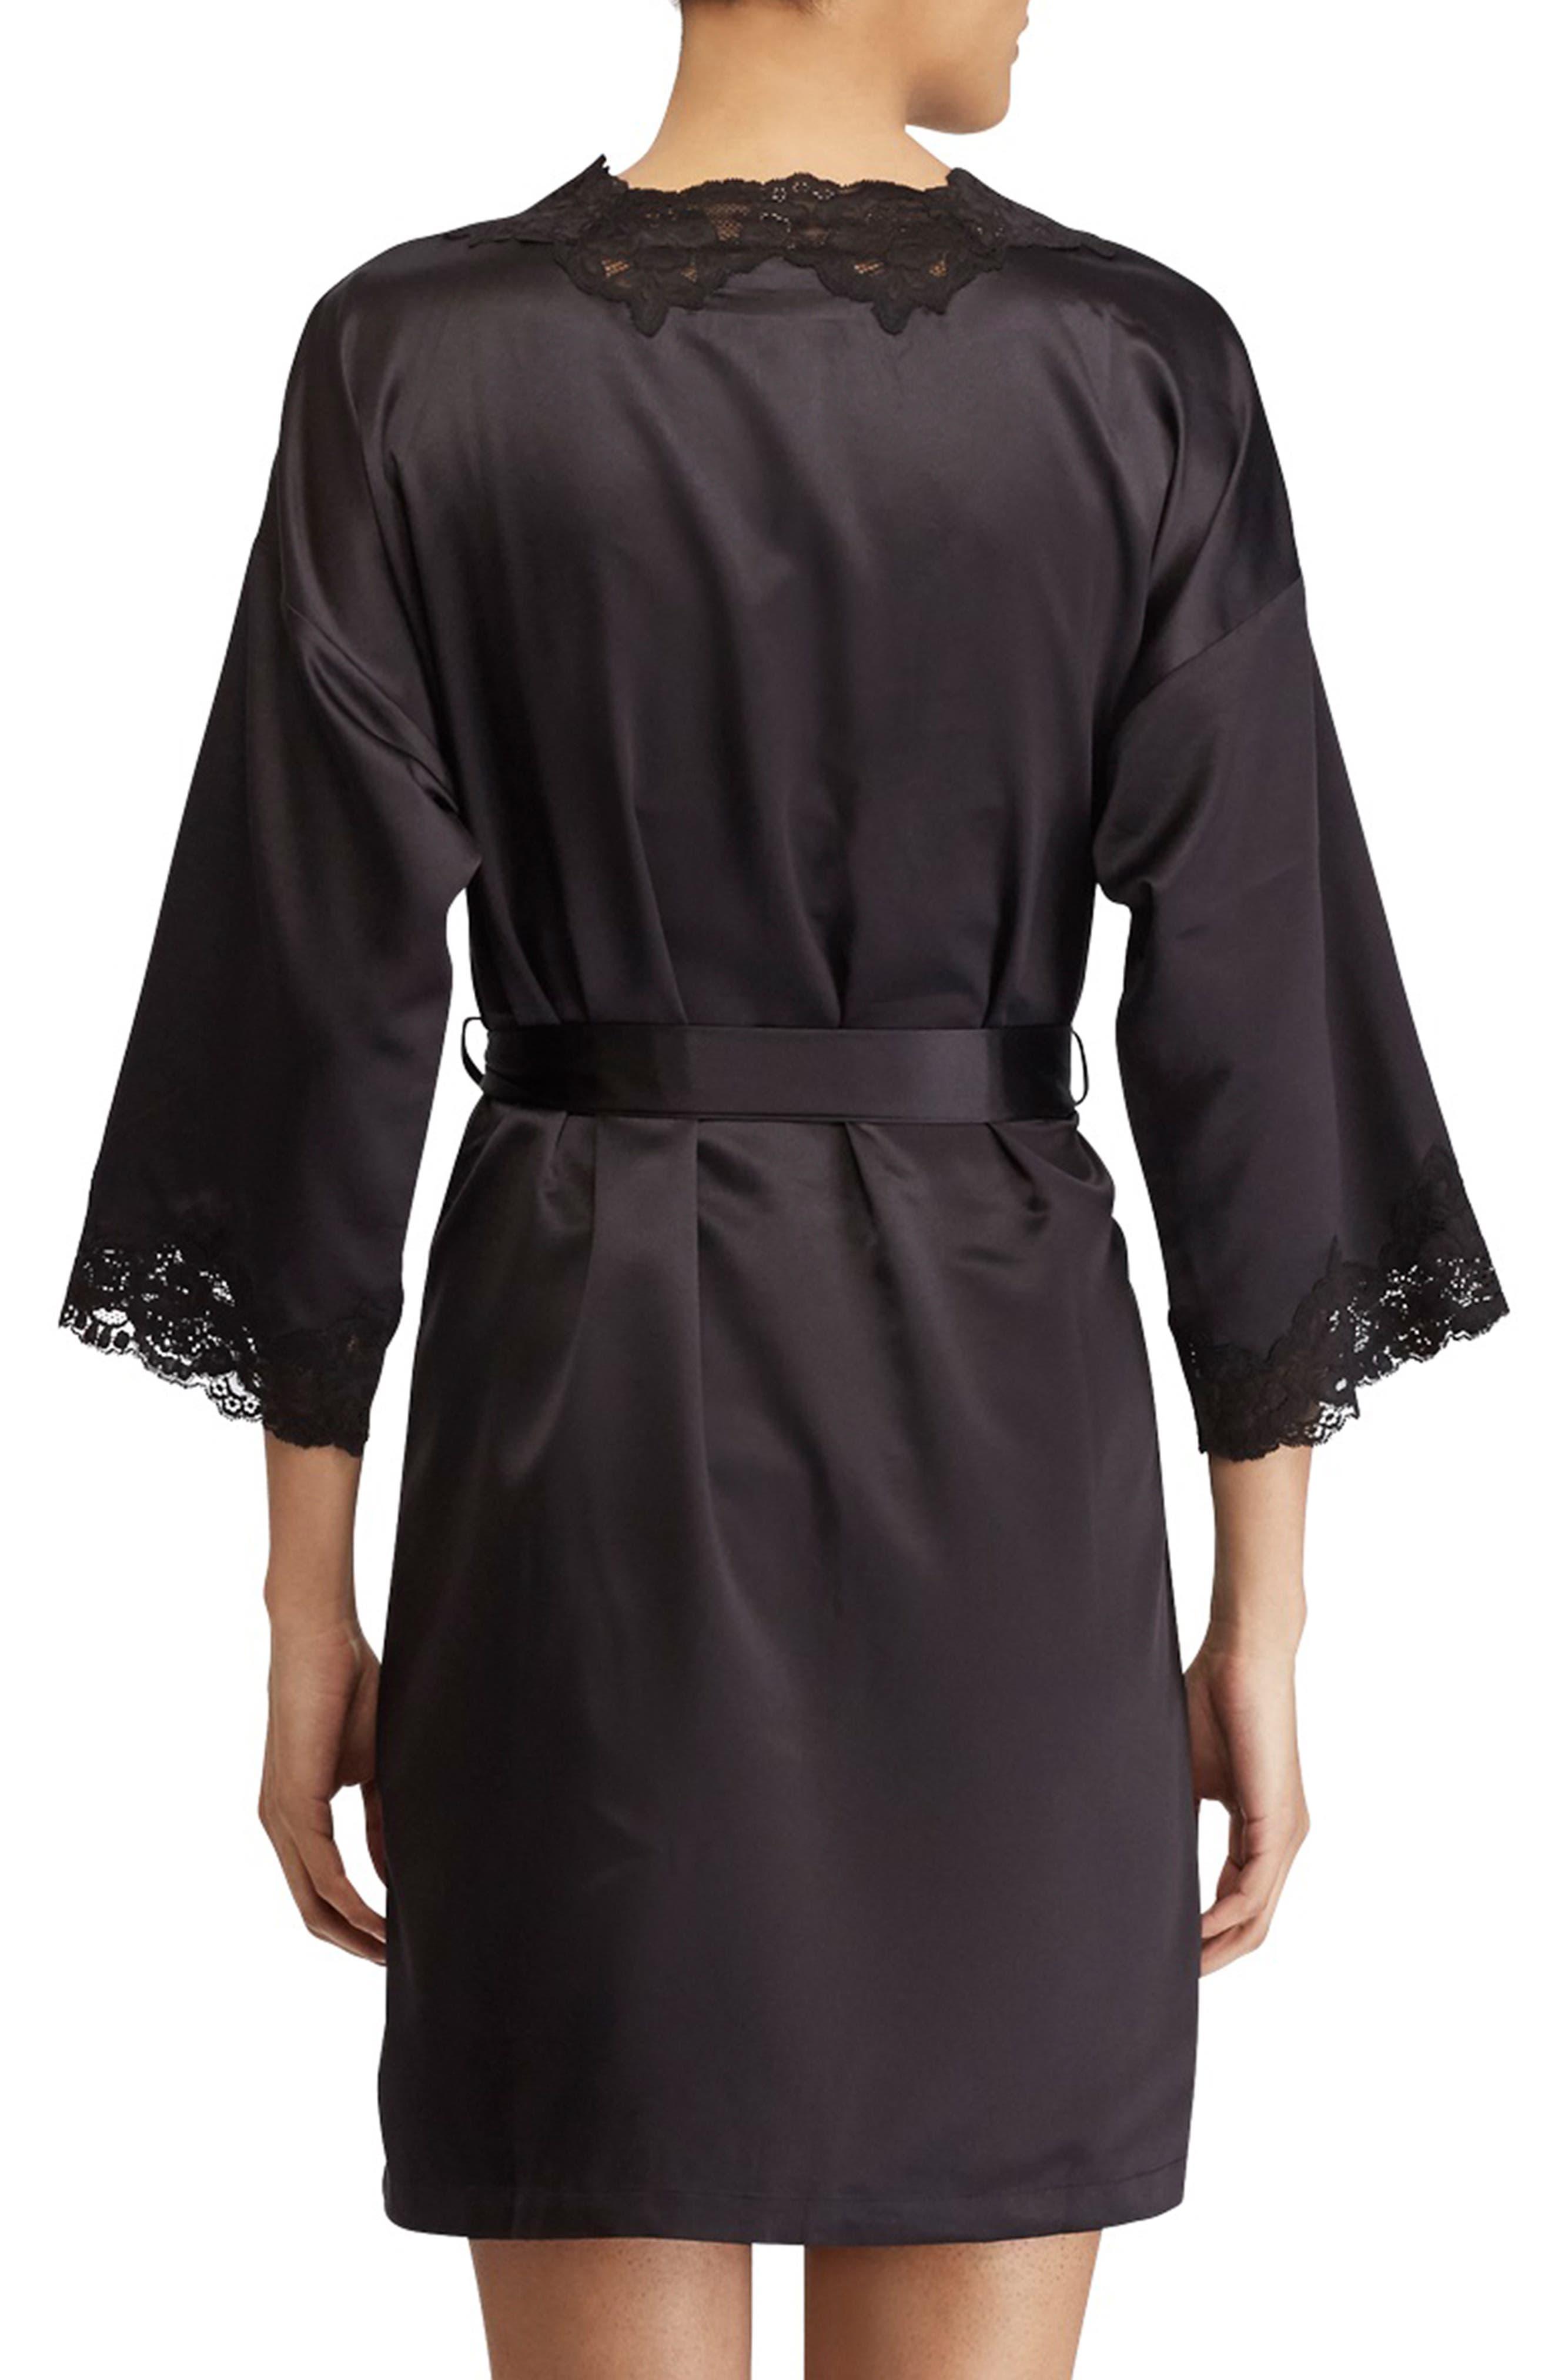 LAUREN RALPH LAUREN,                             Lace Trim Houndstooth Satin Robe,                             Alternate thumbnail 2, color,                             BLACK